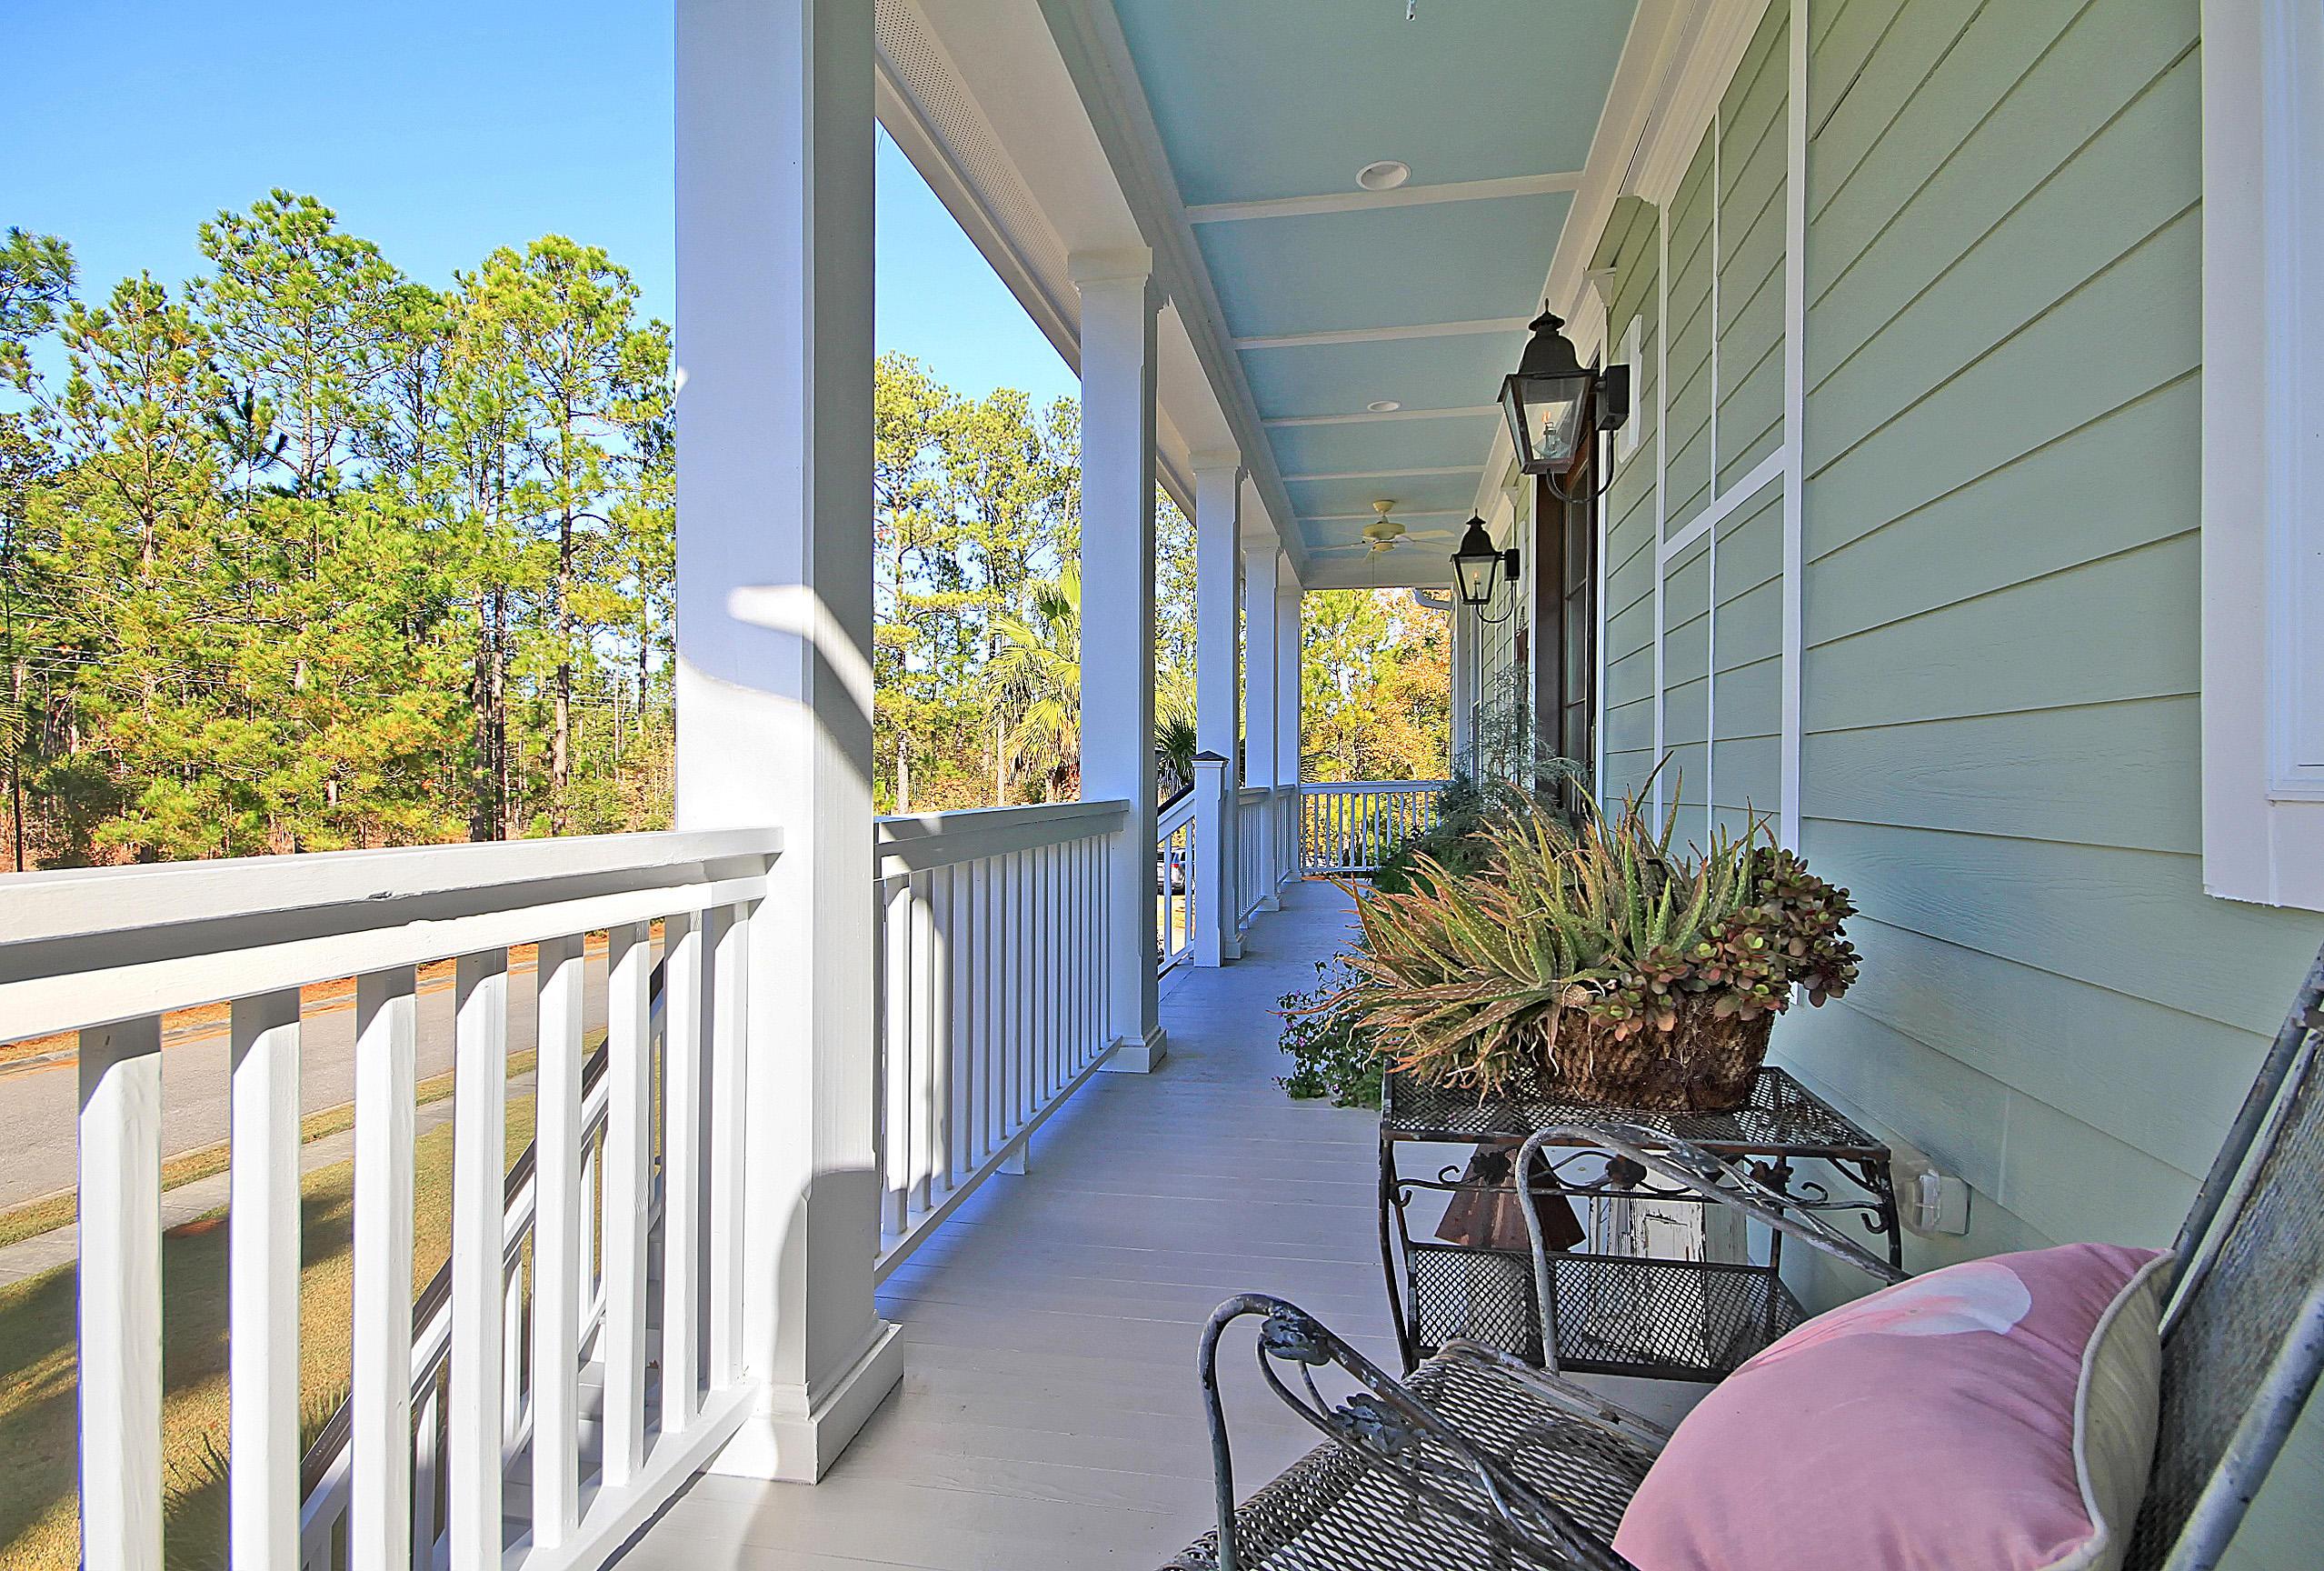 Rivertowne Country Club Homes For Sale - 2601 Kiln Creek, Mount Pleasant, SC - 29